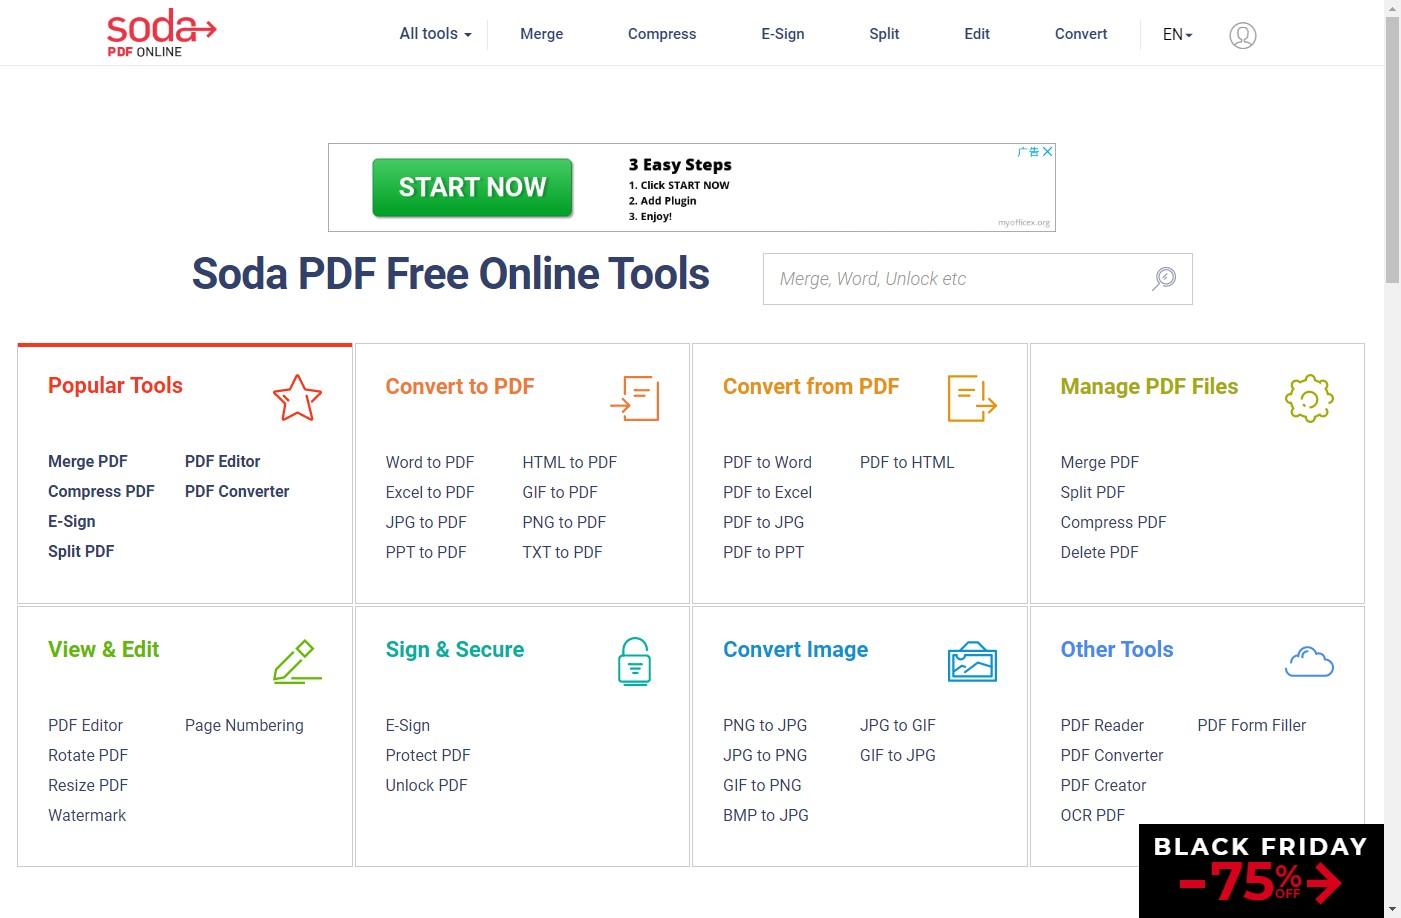 sodapdf pdf to rtf converter